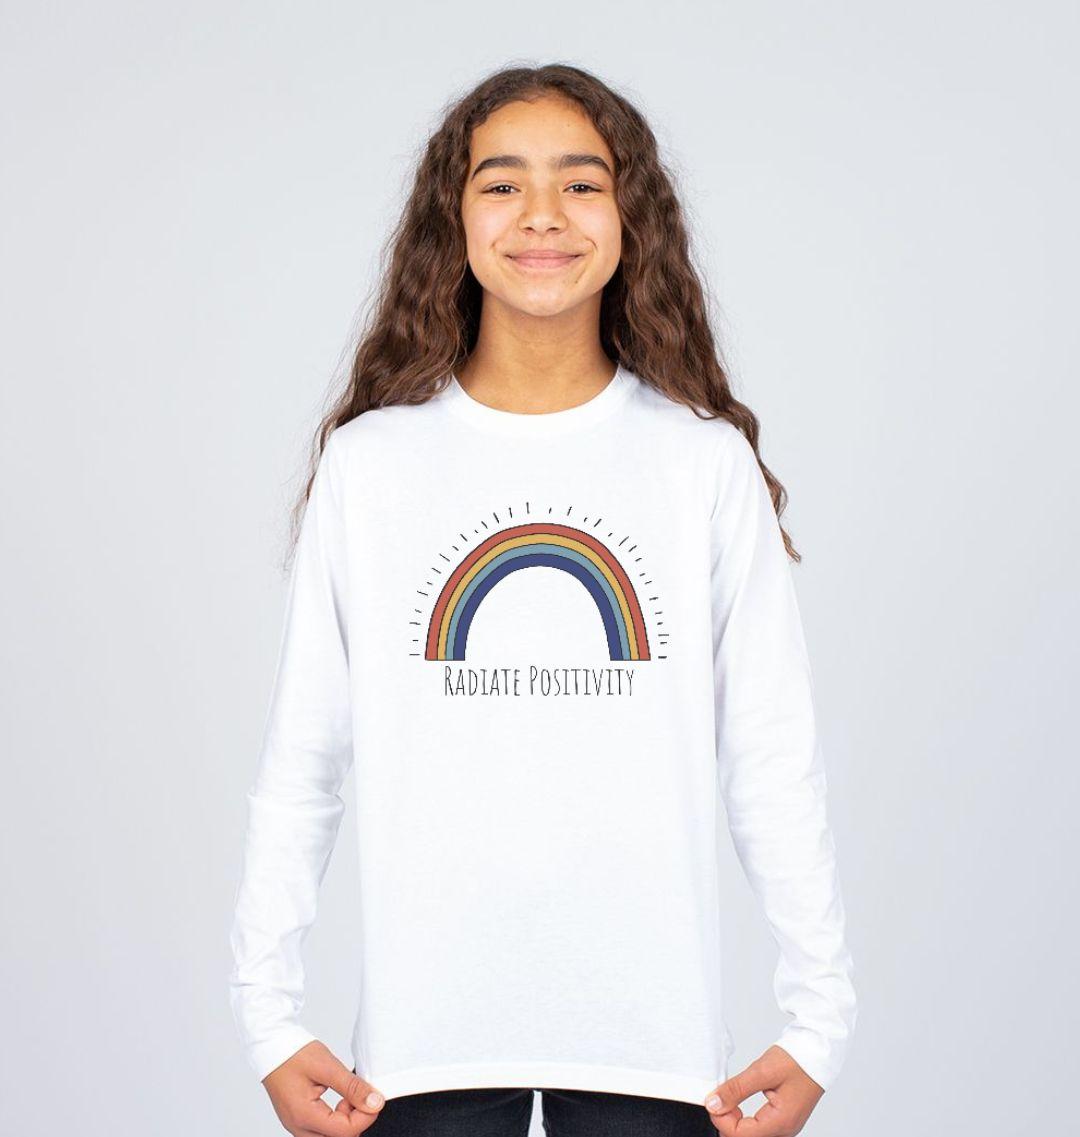 'Radiate Positivity' Rainbow Children's T Shirt - Soft Organic Cotton white